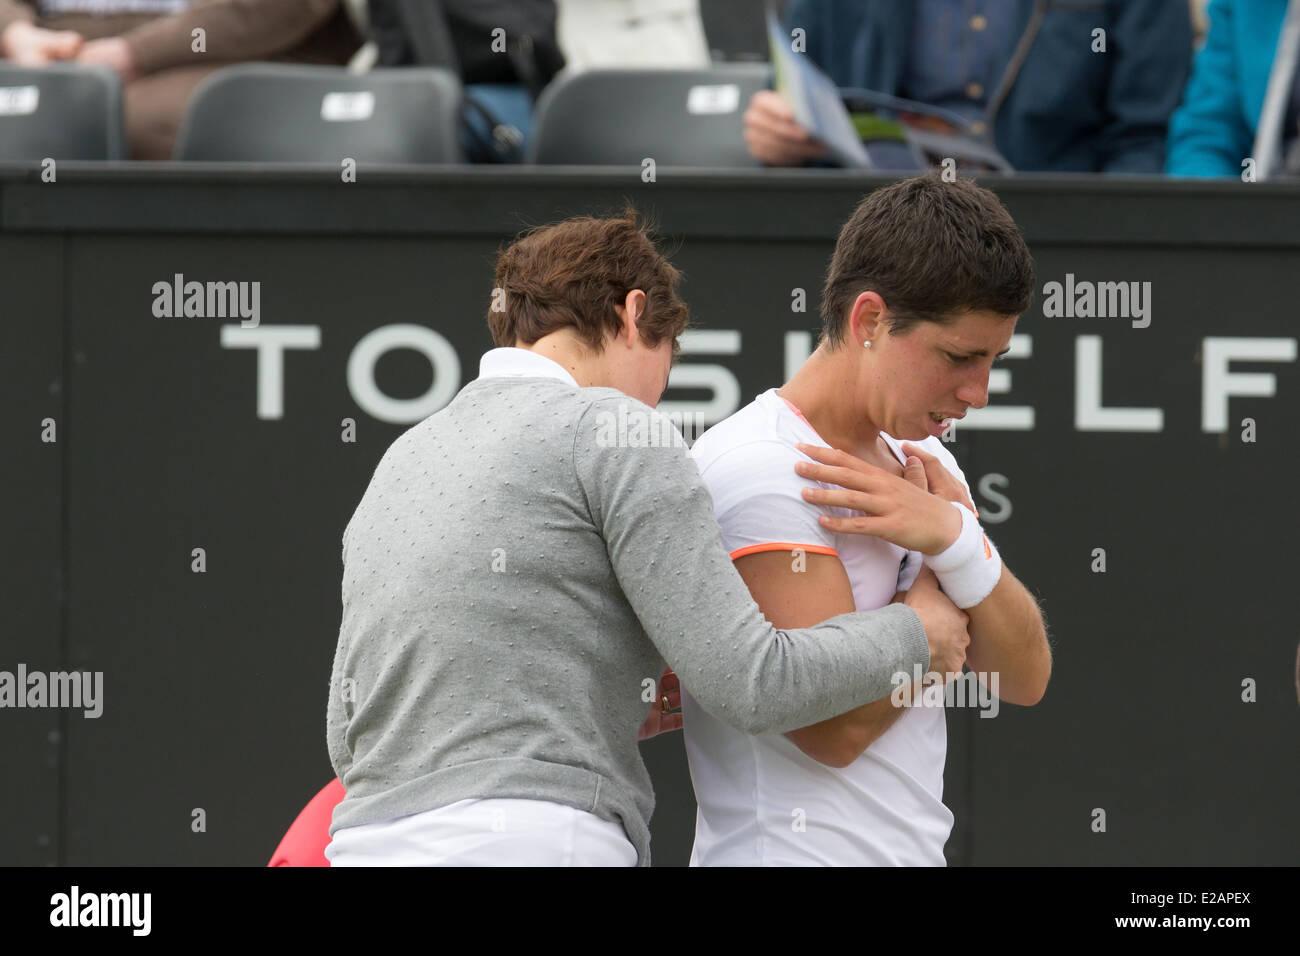 Tennis player carla suarez navarro esp receives a medical treatment during her 2nd round